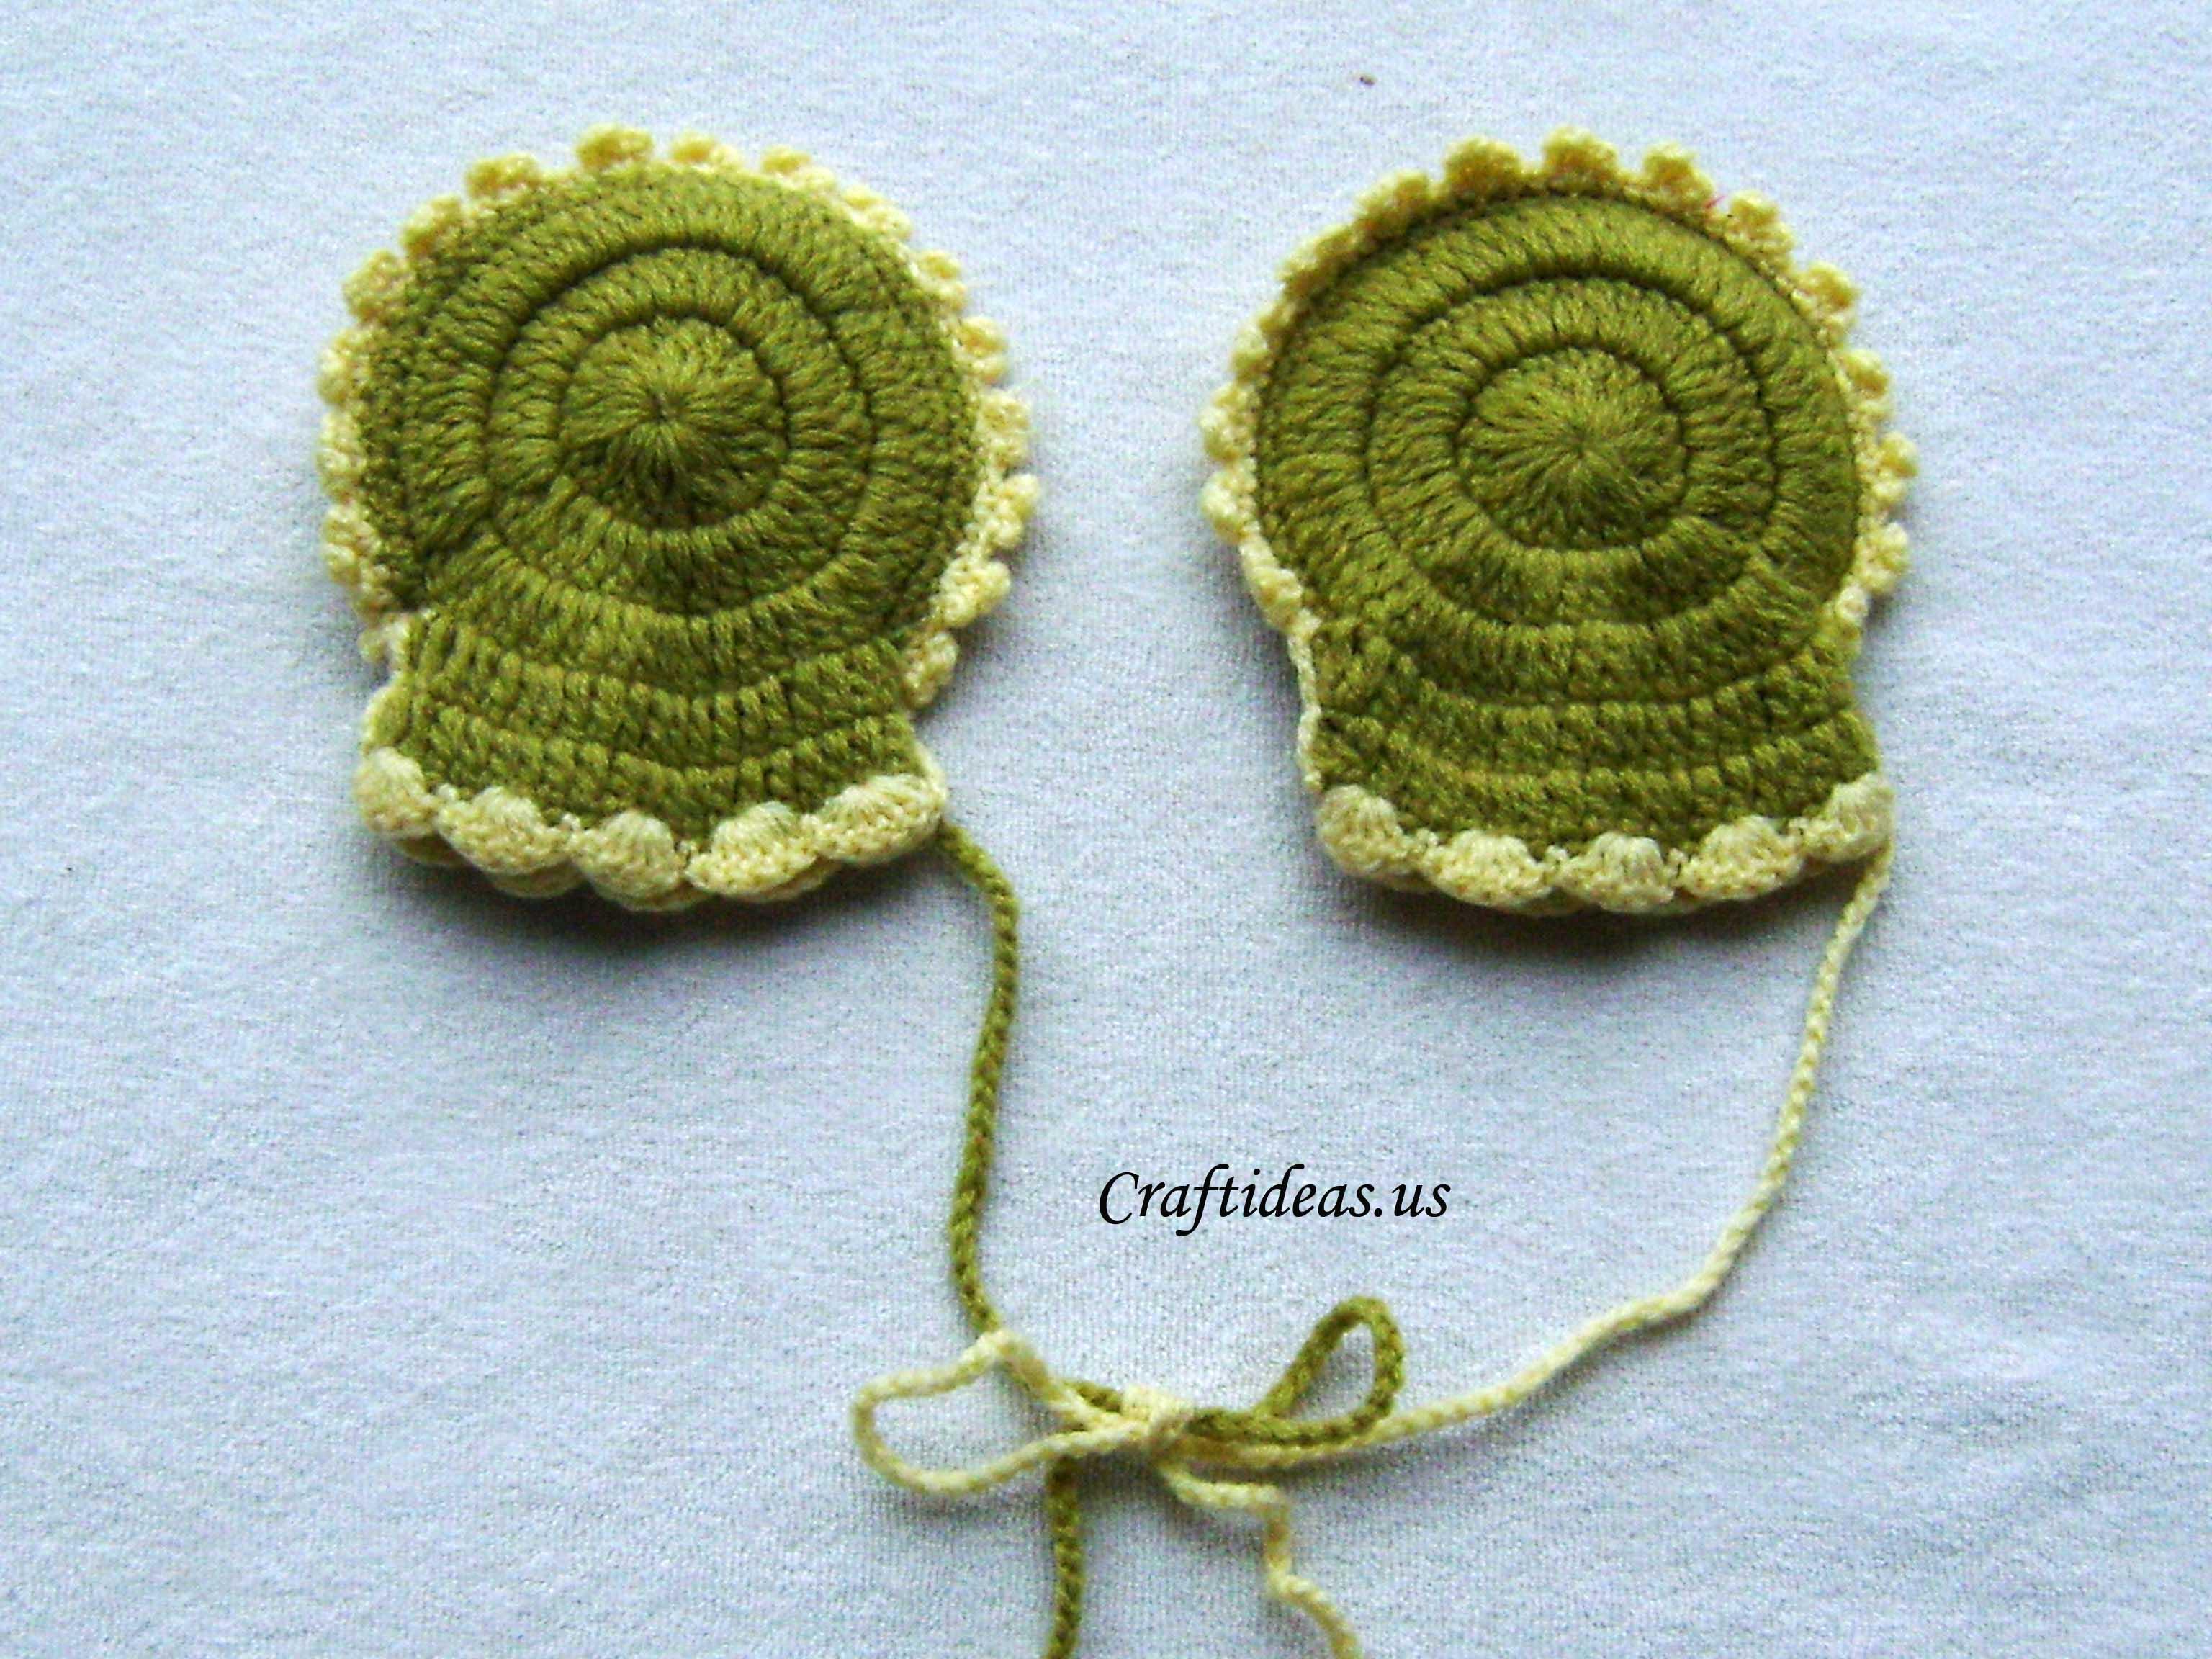 Crochet baby mittens tutorial craft ideas crochet round mittens tutorial bankloansurffo Images